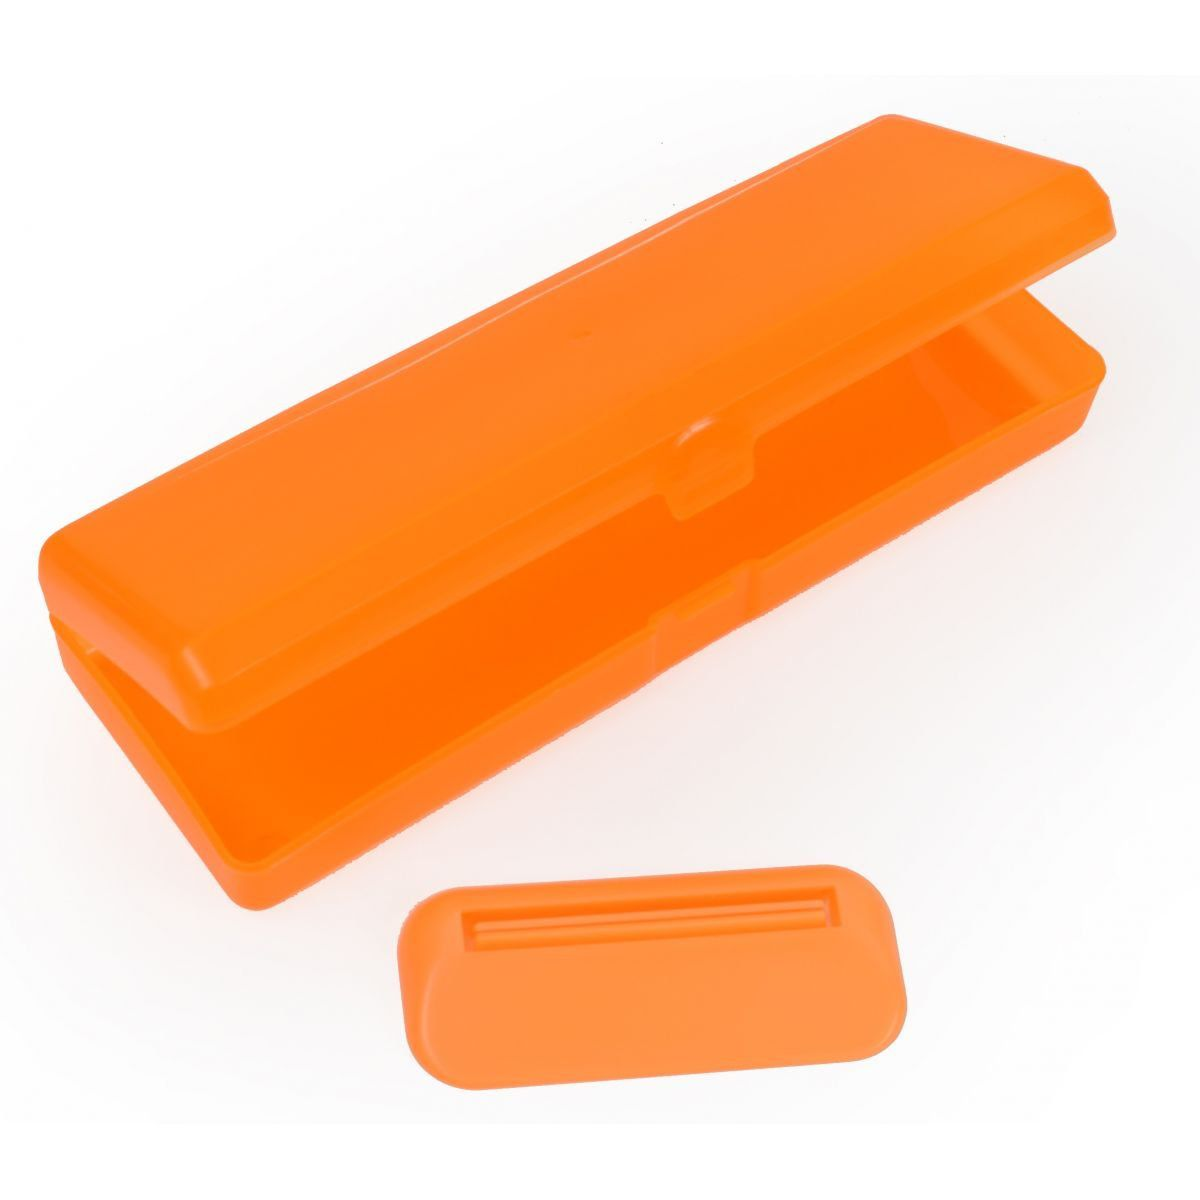 8591d895c Estojo Dental Plástico Com Espremedor De Tubo - Santa Clara. Higiene